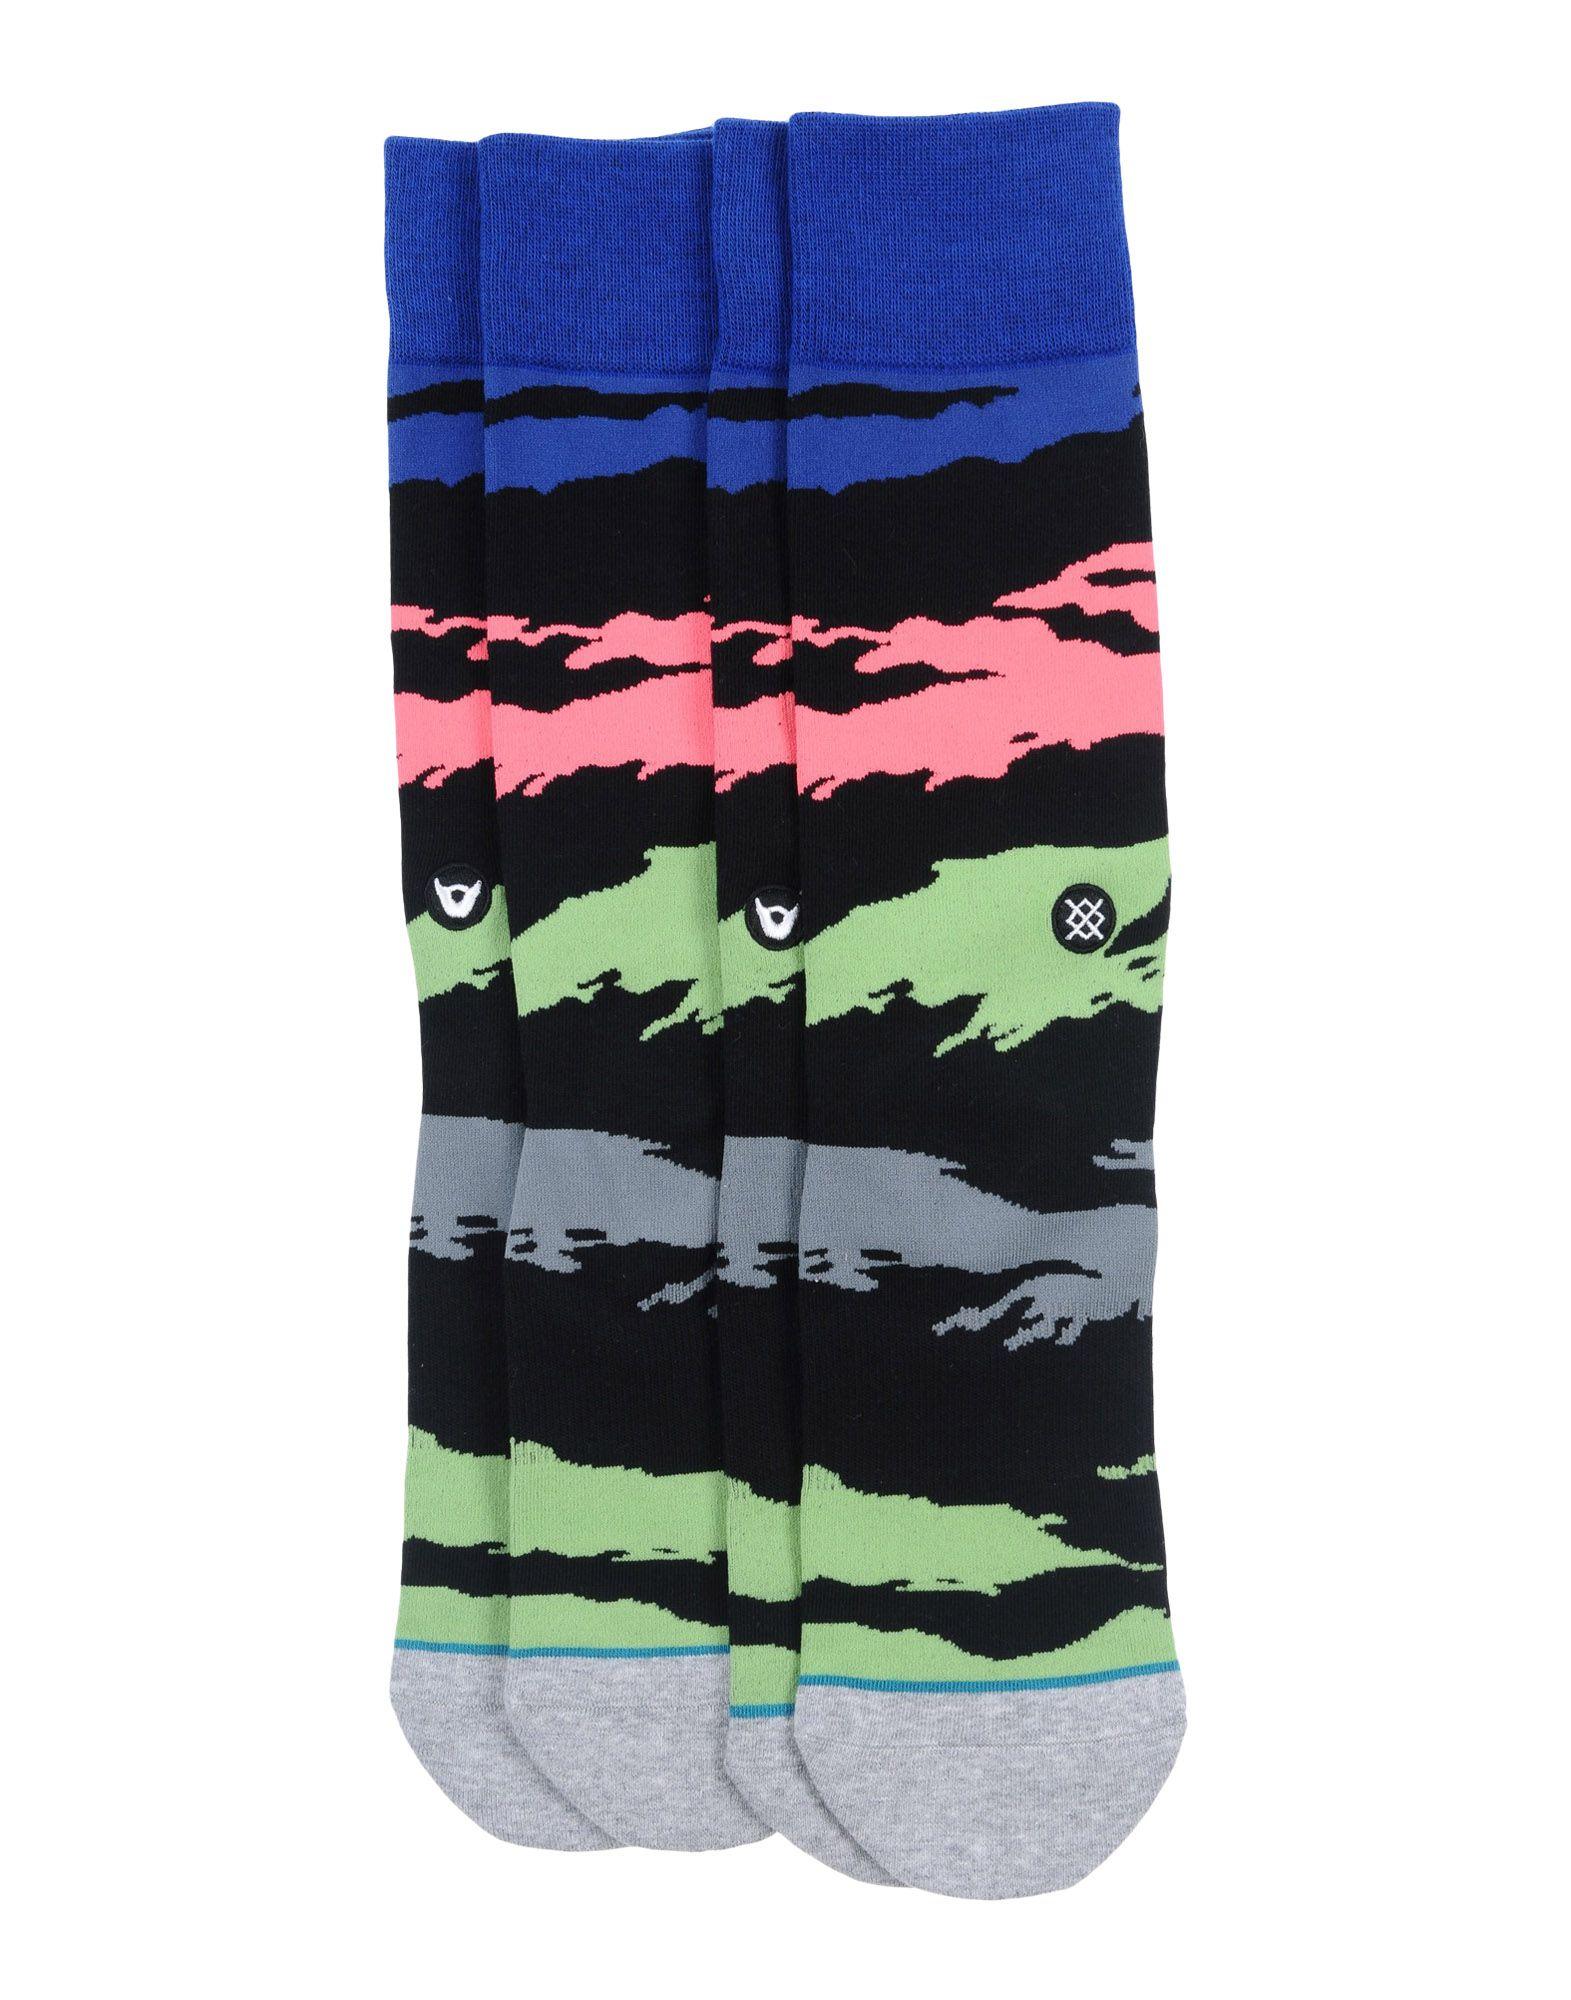 STANCE Короткие носки носки средние женские stance retro an teal